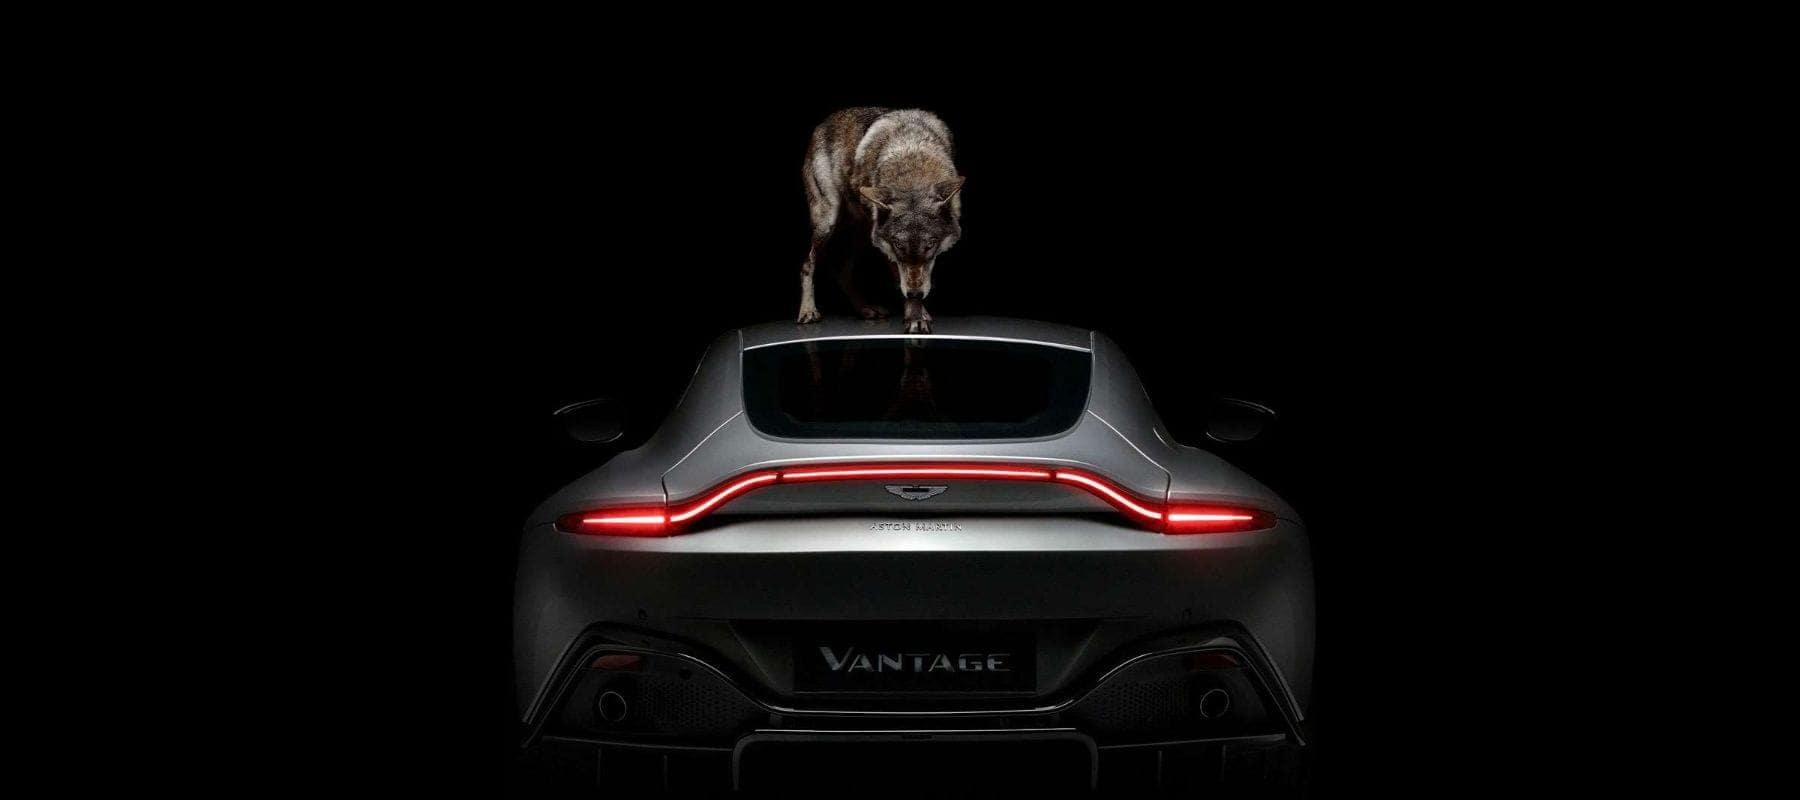 2019 Aston Martin Vantage pic_001